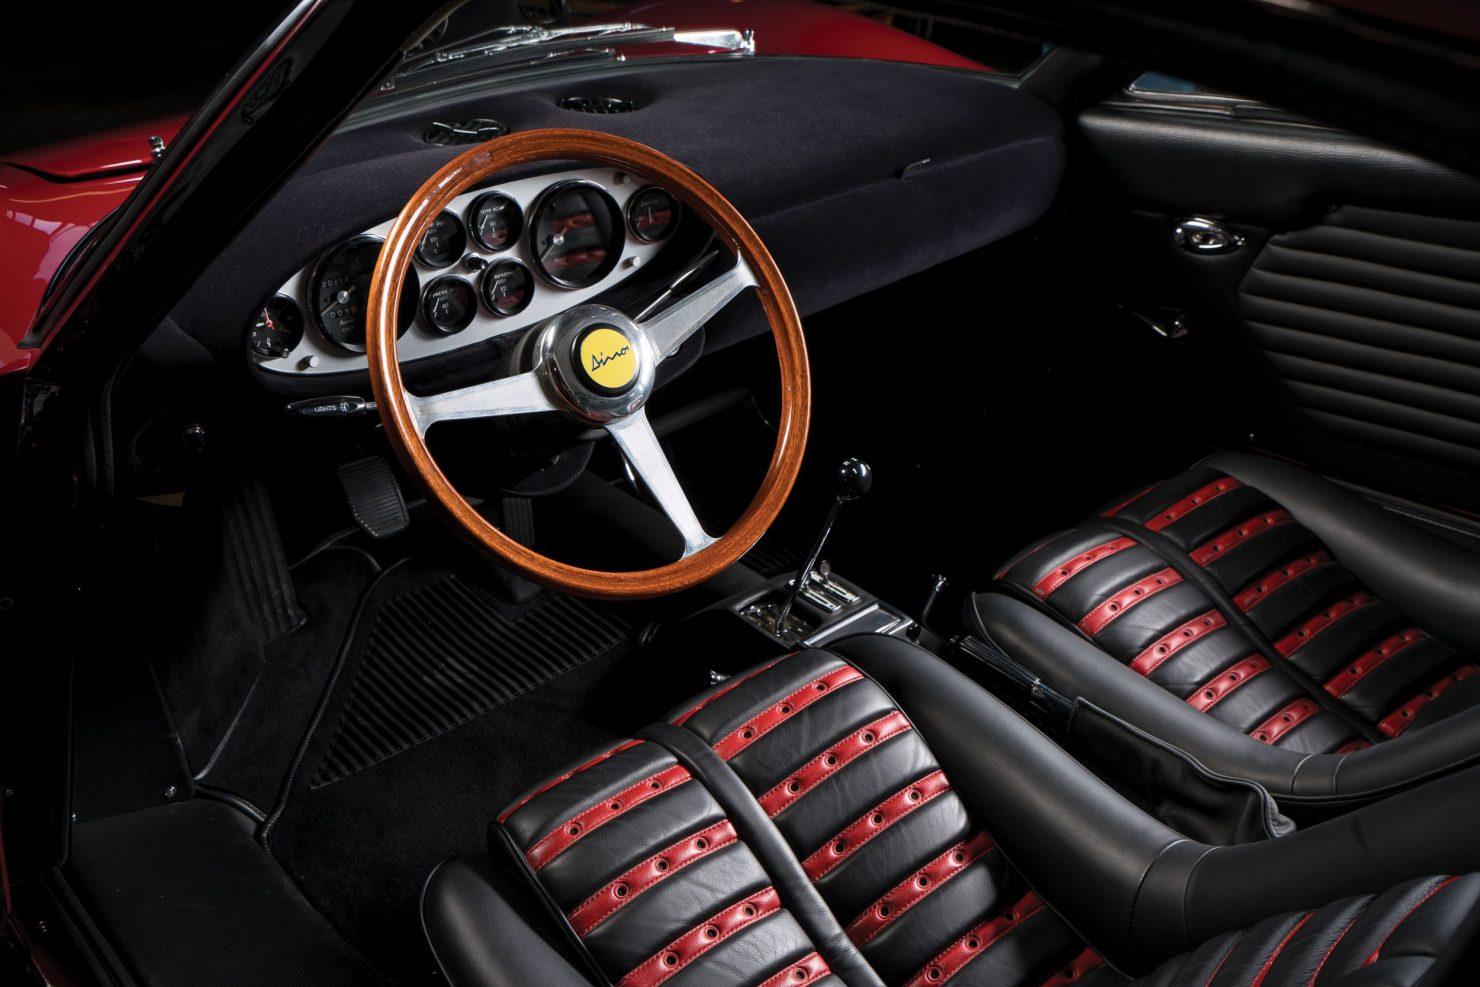 ferrari dino 246 4 1480x987 - 1969 Ferrari Dino 246 GT